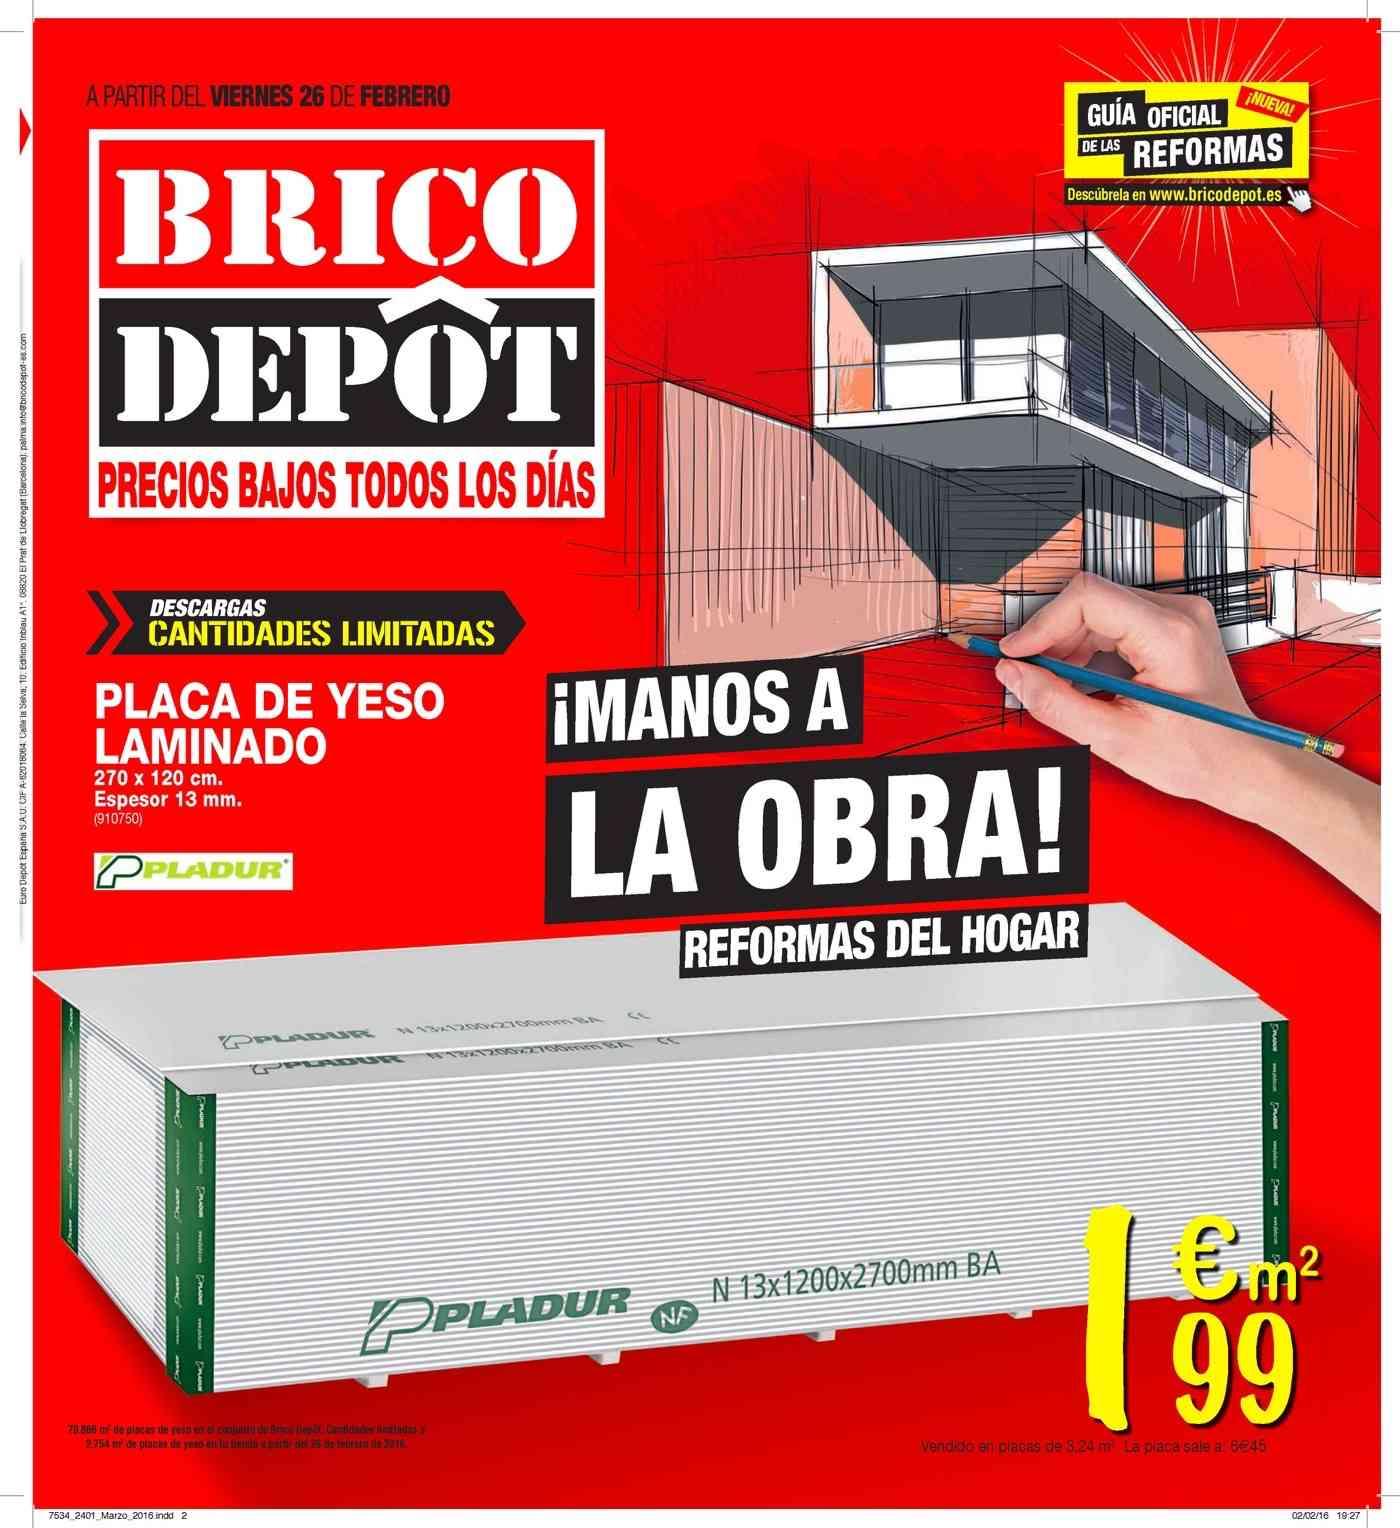 Tarima de pino bricodepot perfect cool interesting top for Piscinas bricodepot